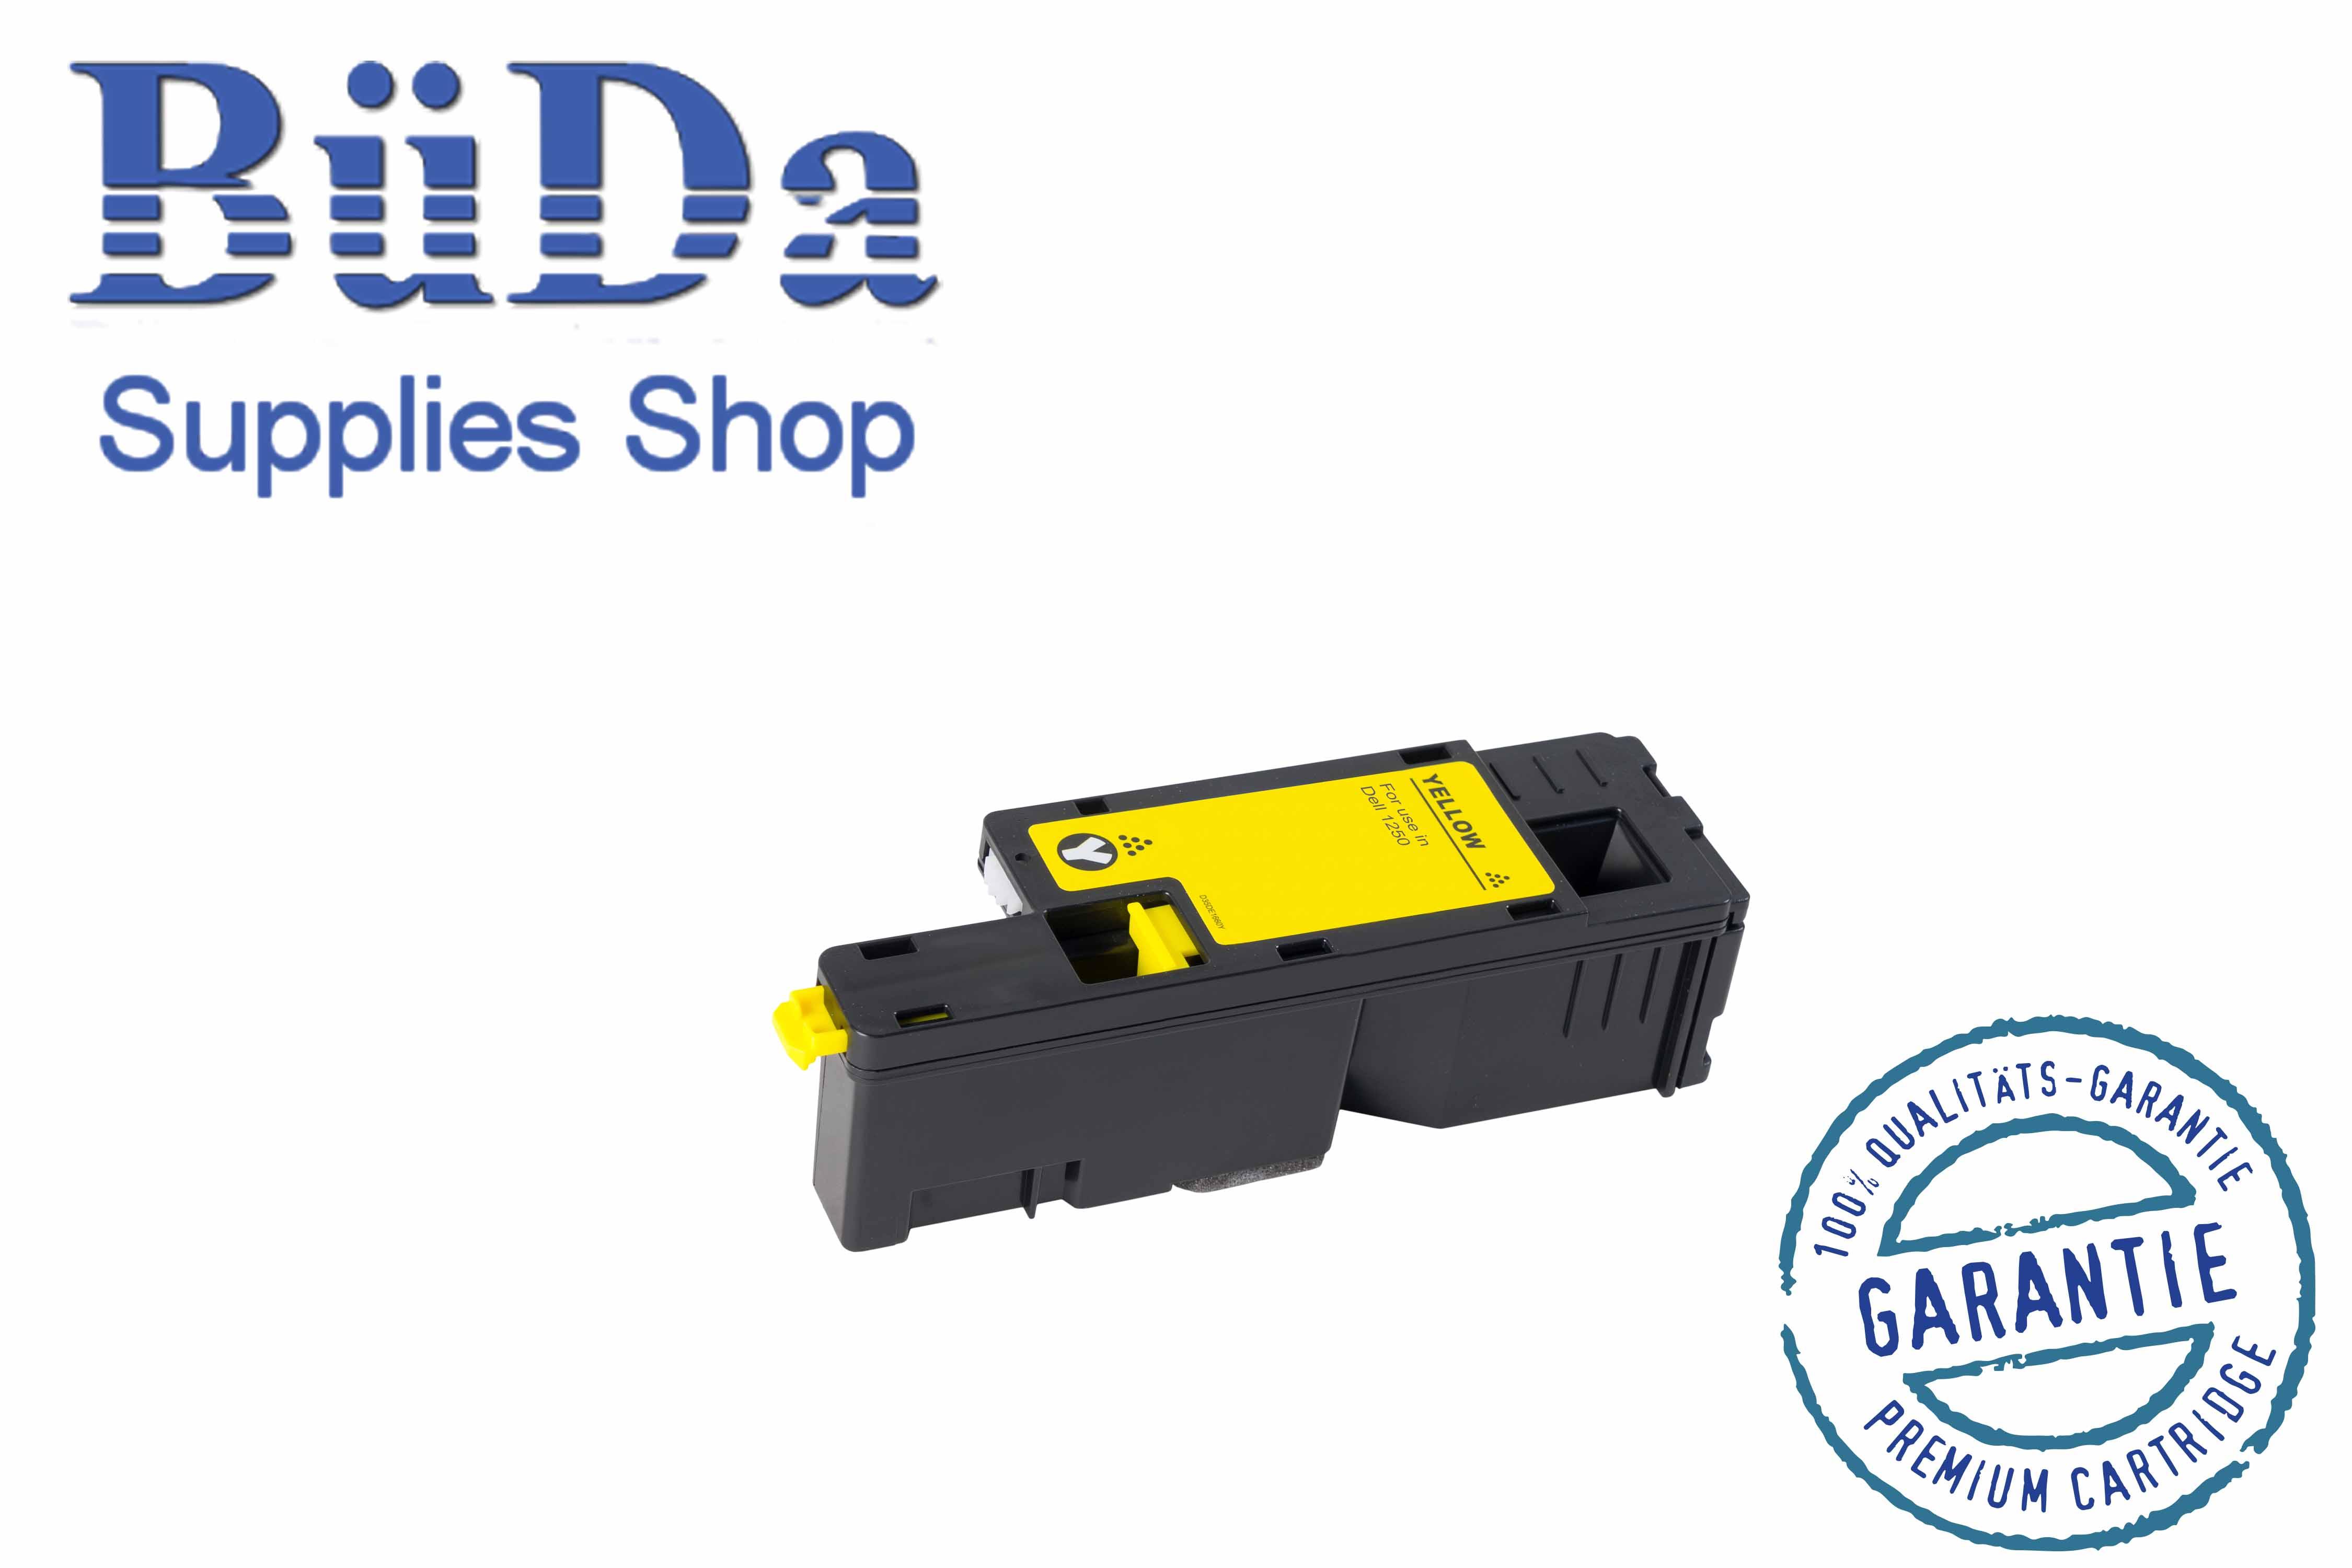 Toner-Modul komp. zu Dell 1250 yellow 1400 Seiten